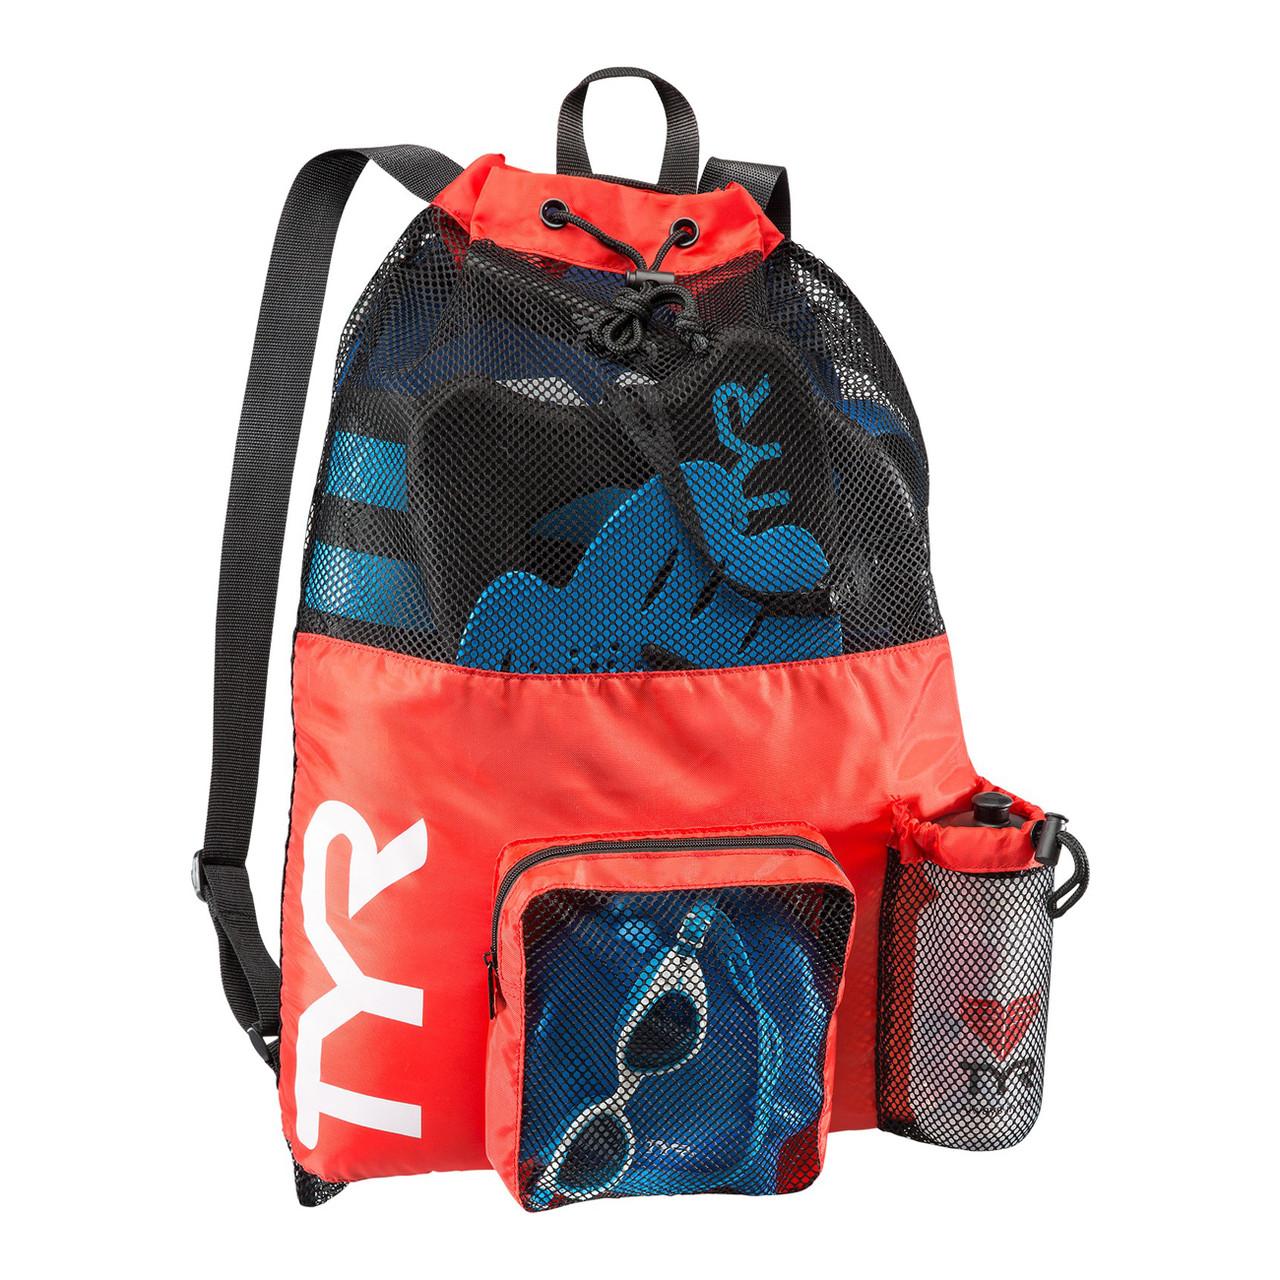 Рюкзак для аксессуаров TYR Big Mesh Mummy Backpack 610